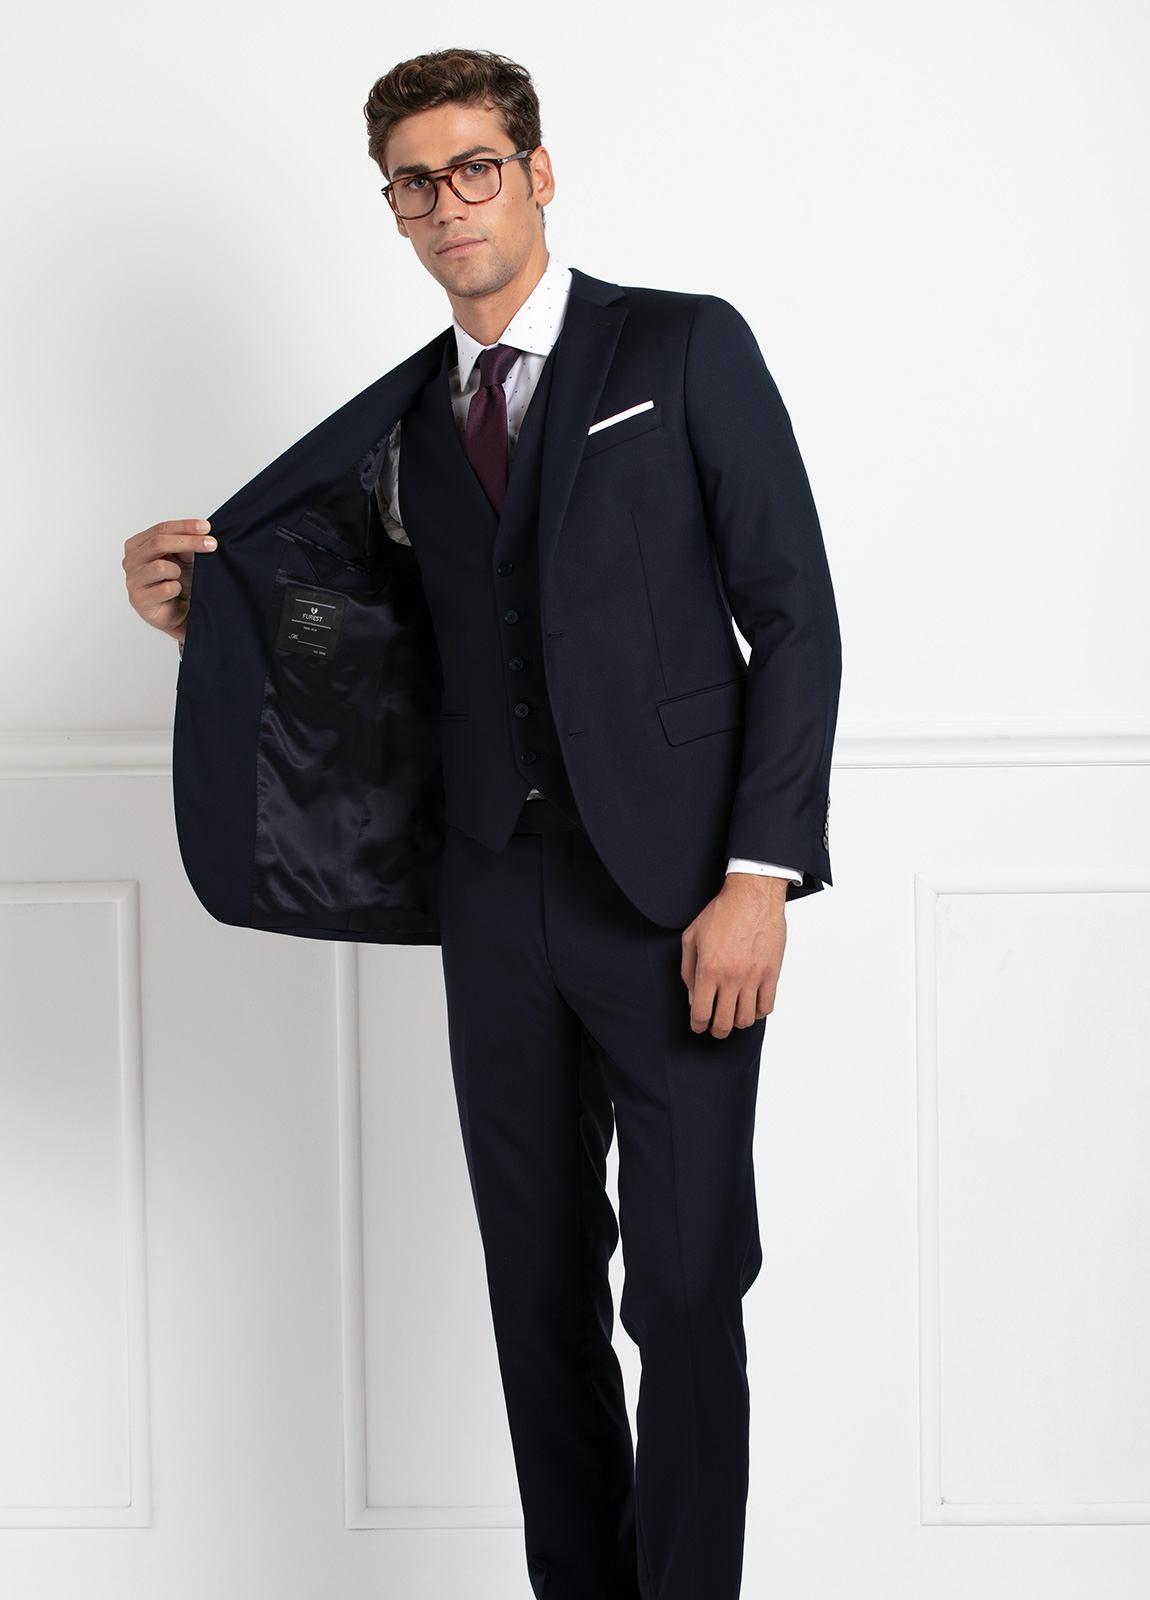 Traje liso SLIM FIT, tejido VBC con chaleco incluido, color azul marino, 100% Lana. - Ítem7